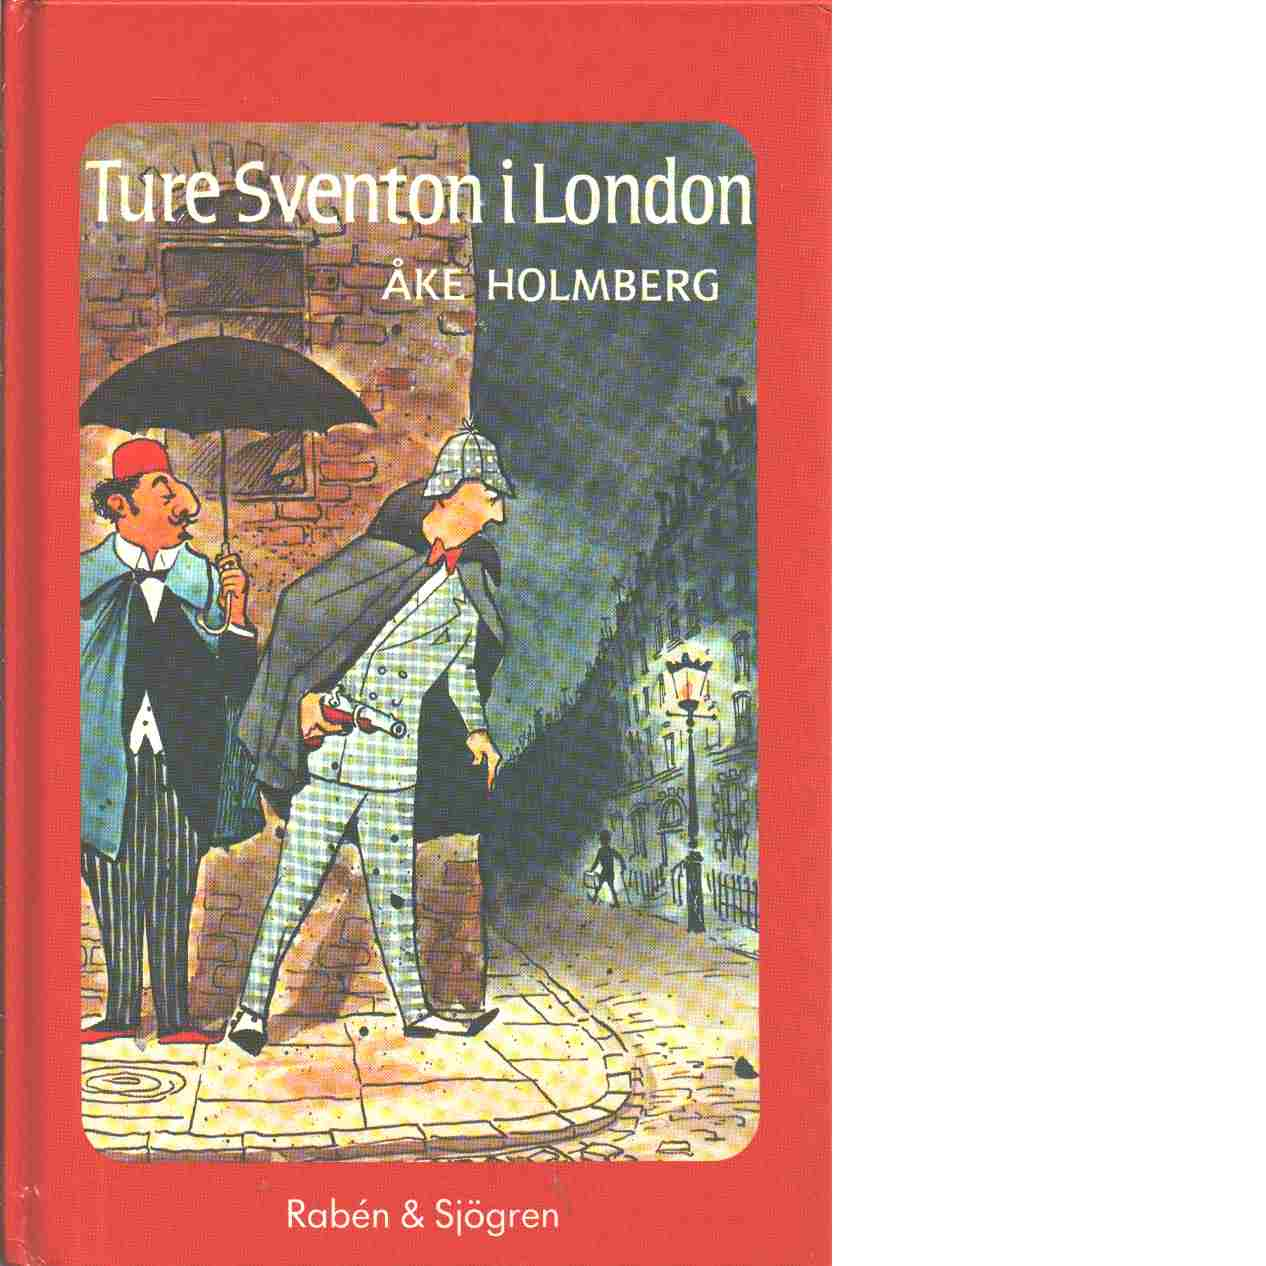 Ture Sventon i London - Holmberg, Åke